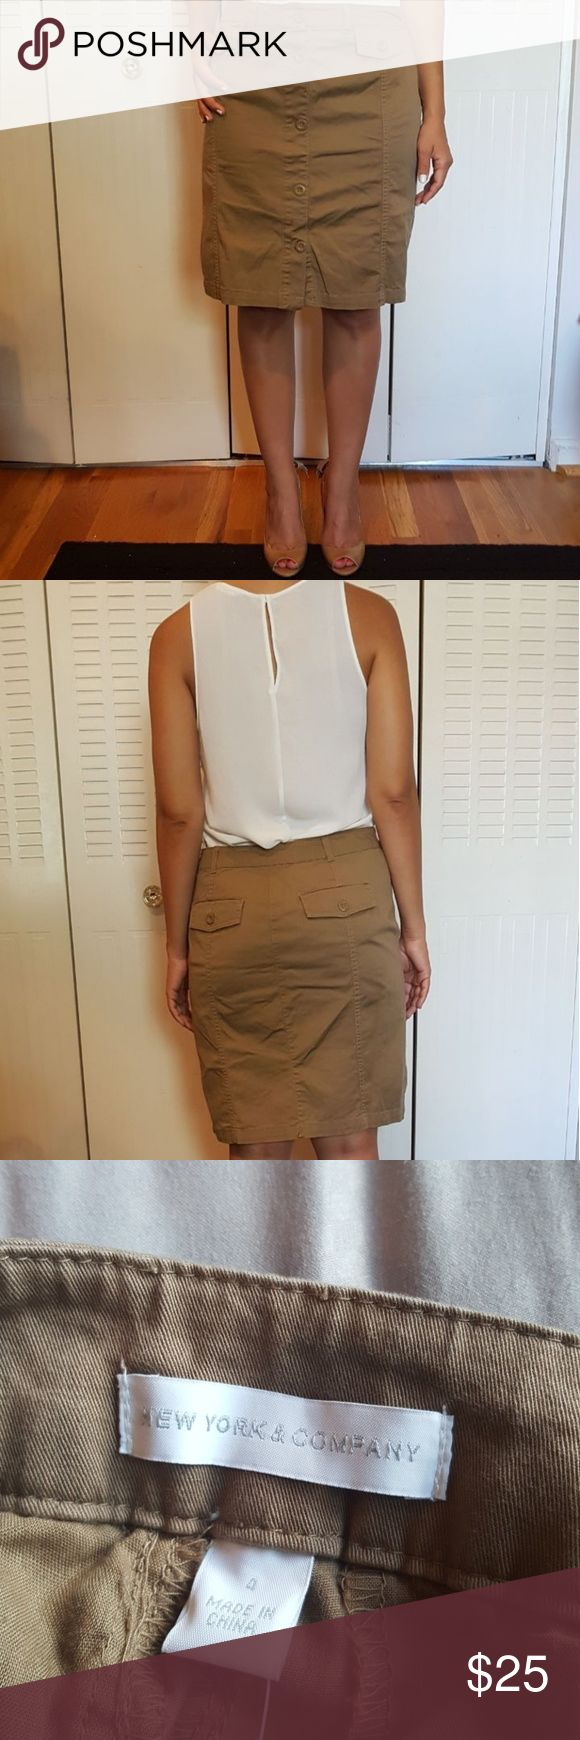 Khaki pencil skirt Skirt is safari inspired. Hits right at the knee. New York & Company Skirts